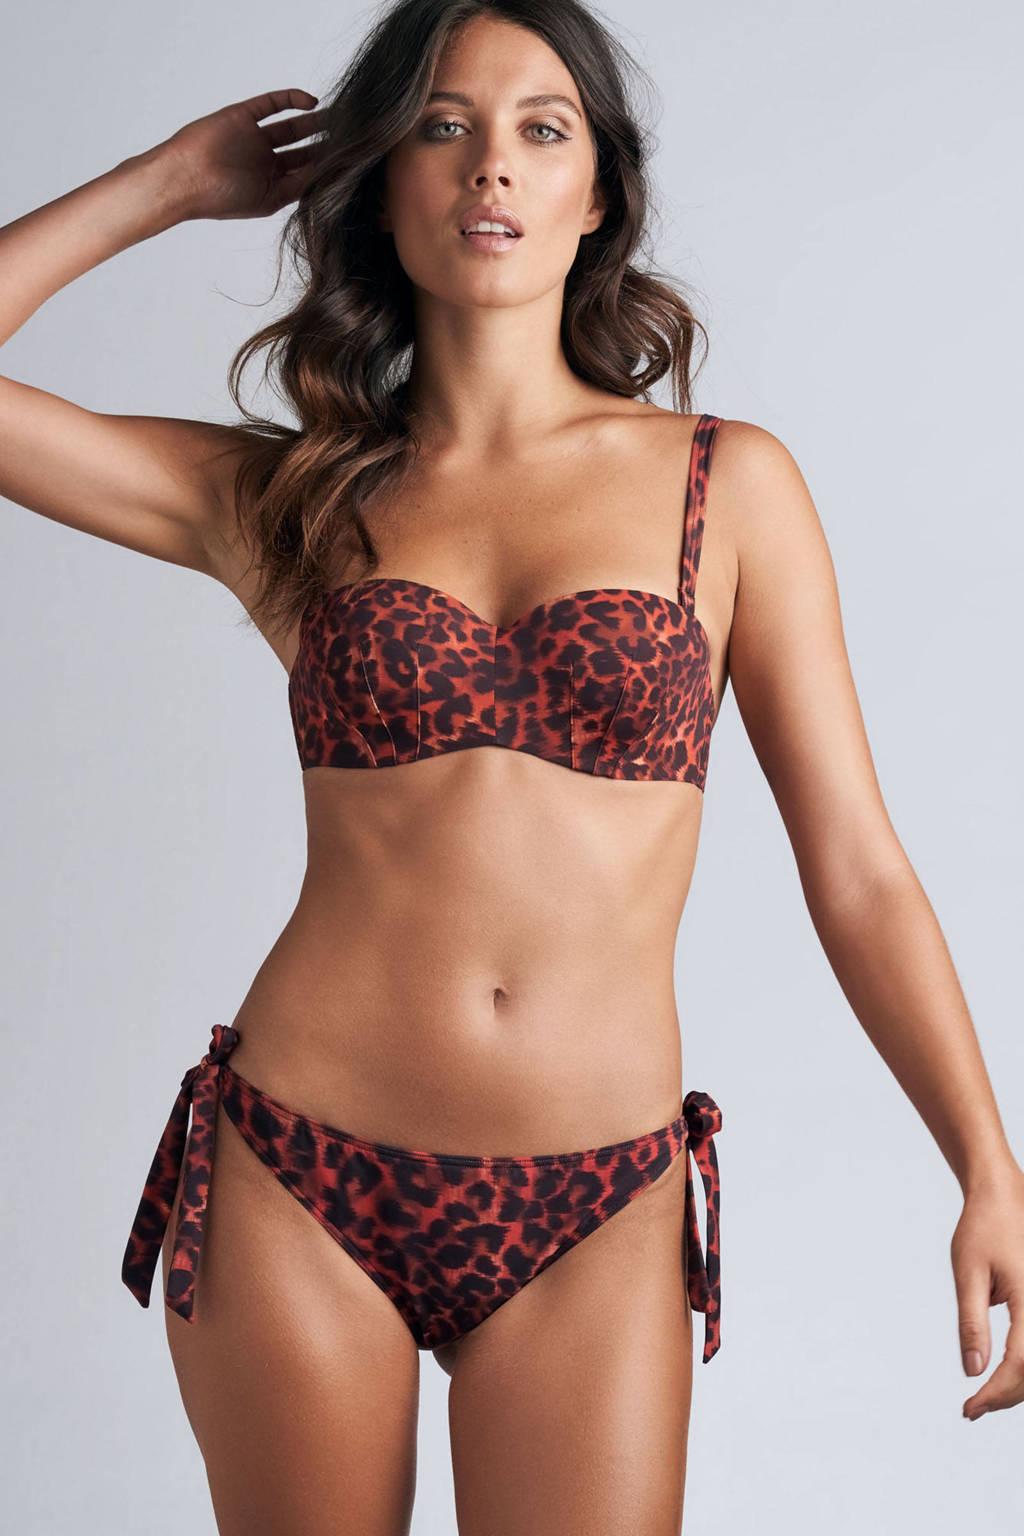 marlies dekkers strik bikinibroekje Panthera rood/zwart, Rood/zwart